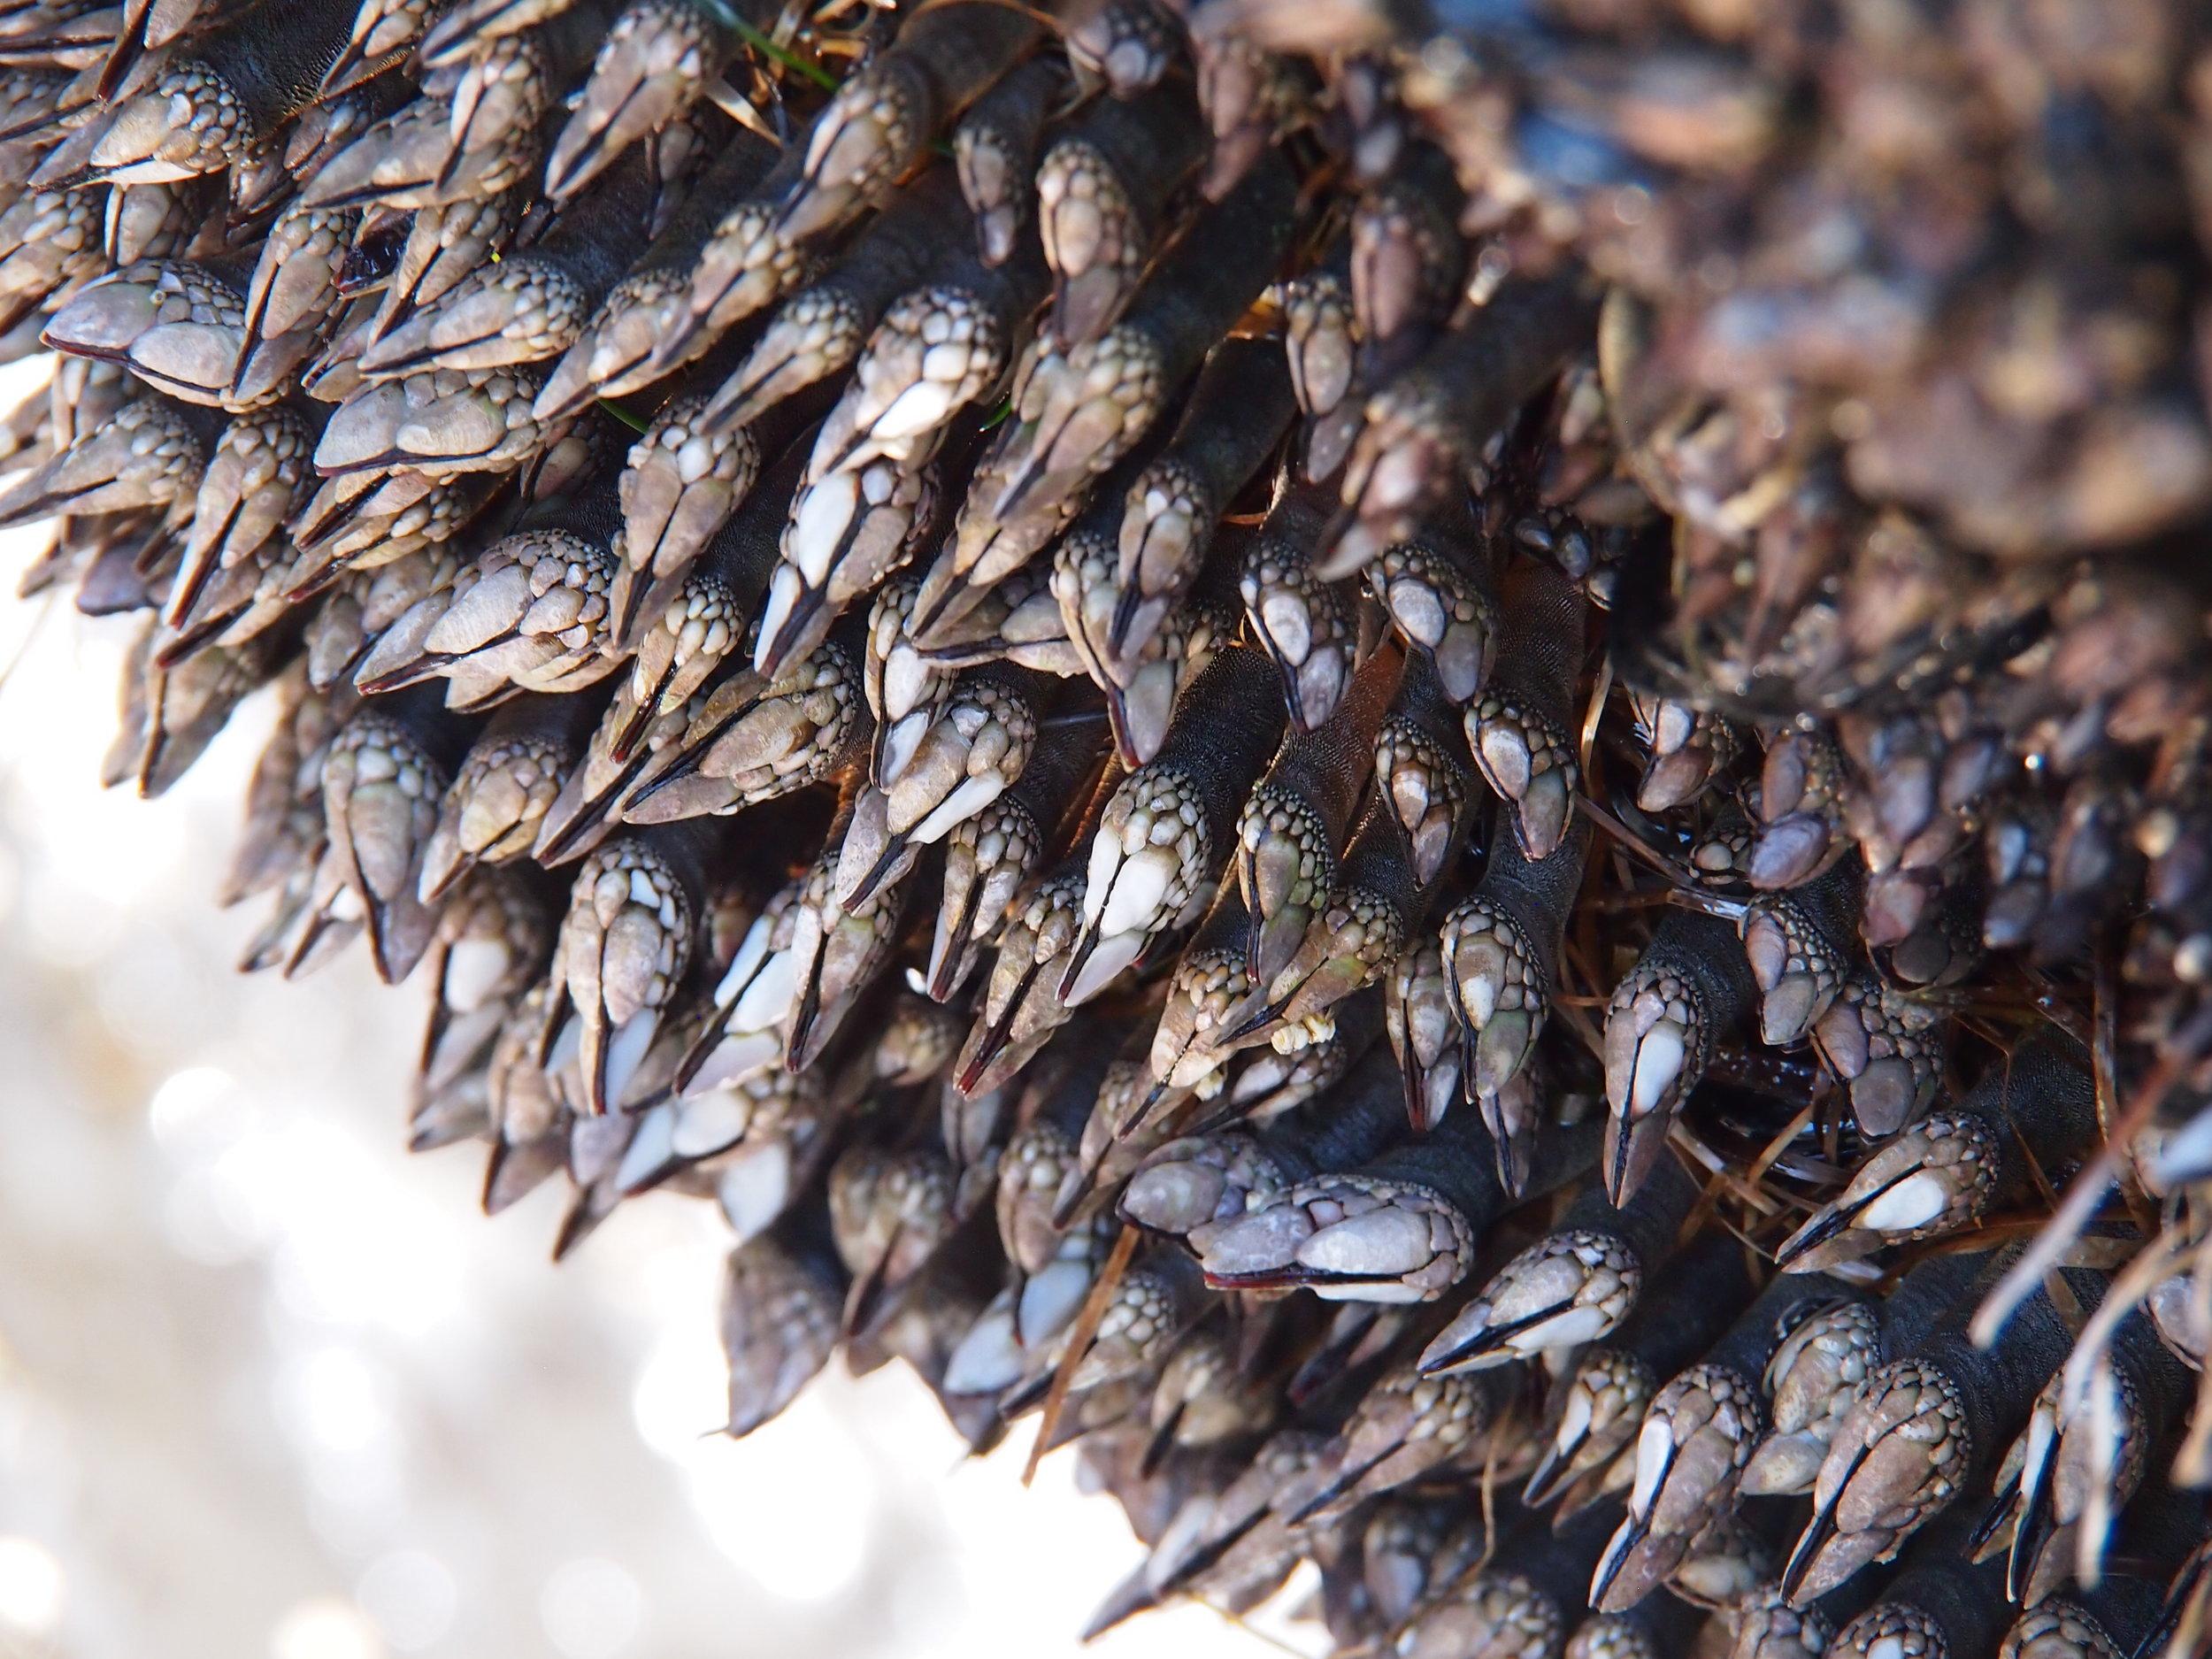 Gooseneck barnacles